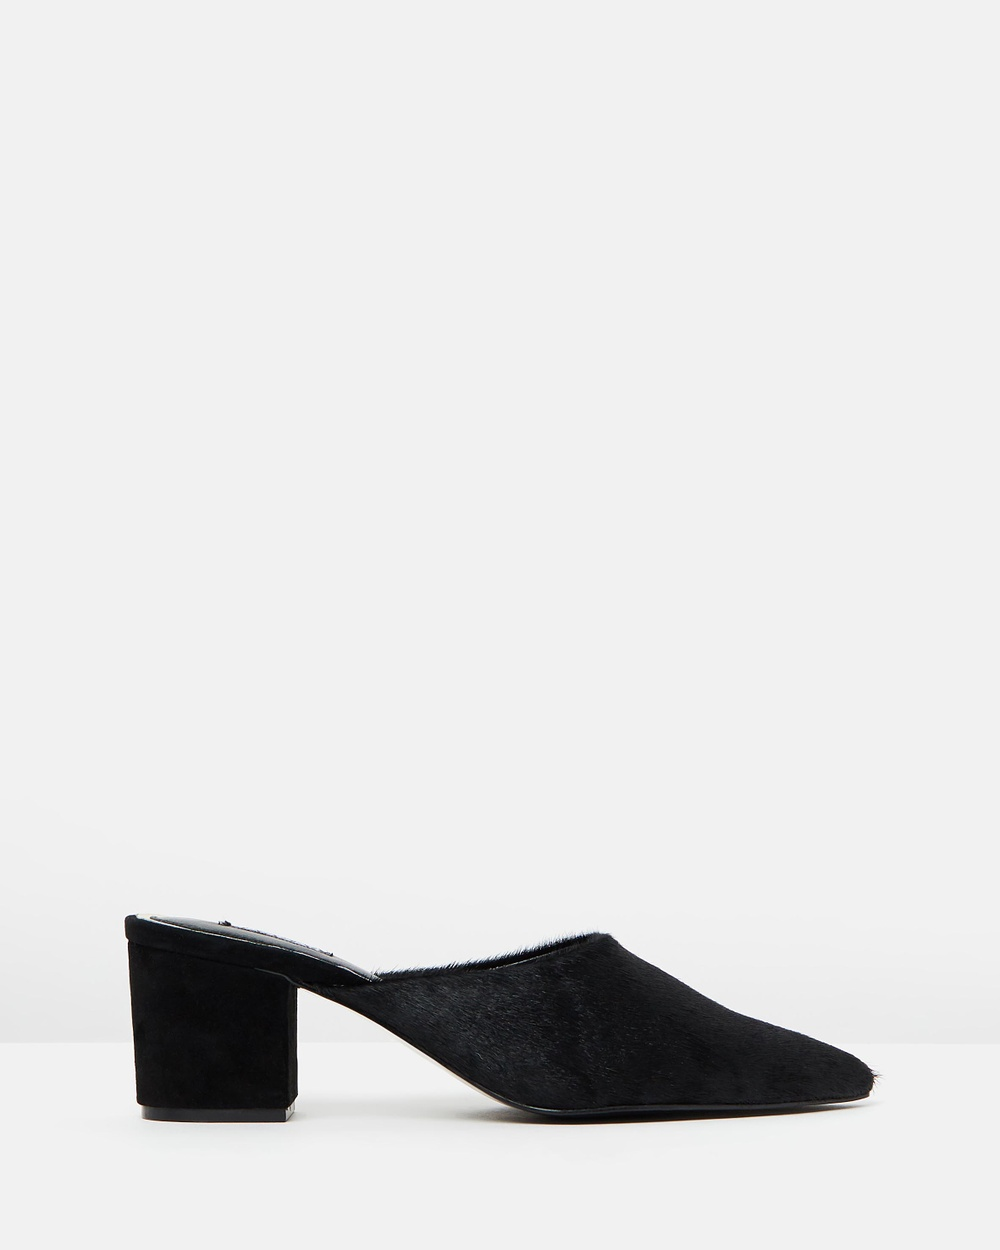 Jaggar Trot Pony Mules Mid-low heels Black Trot Pony Mules